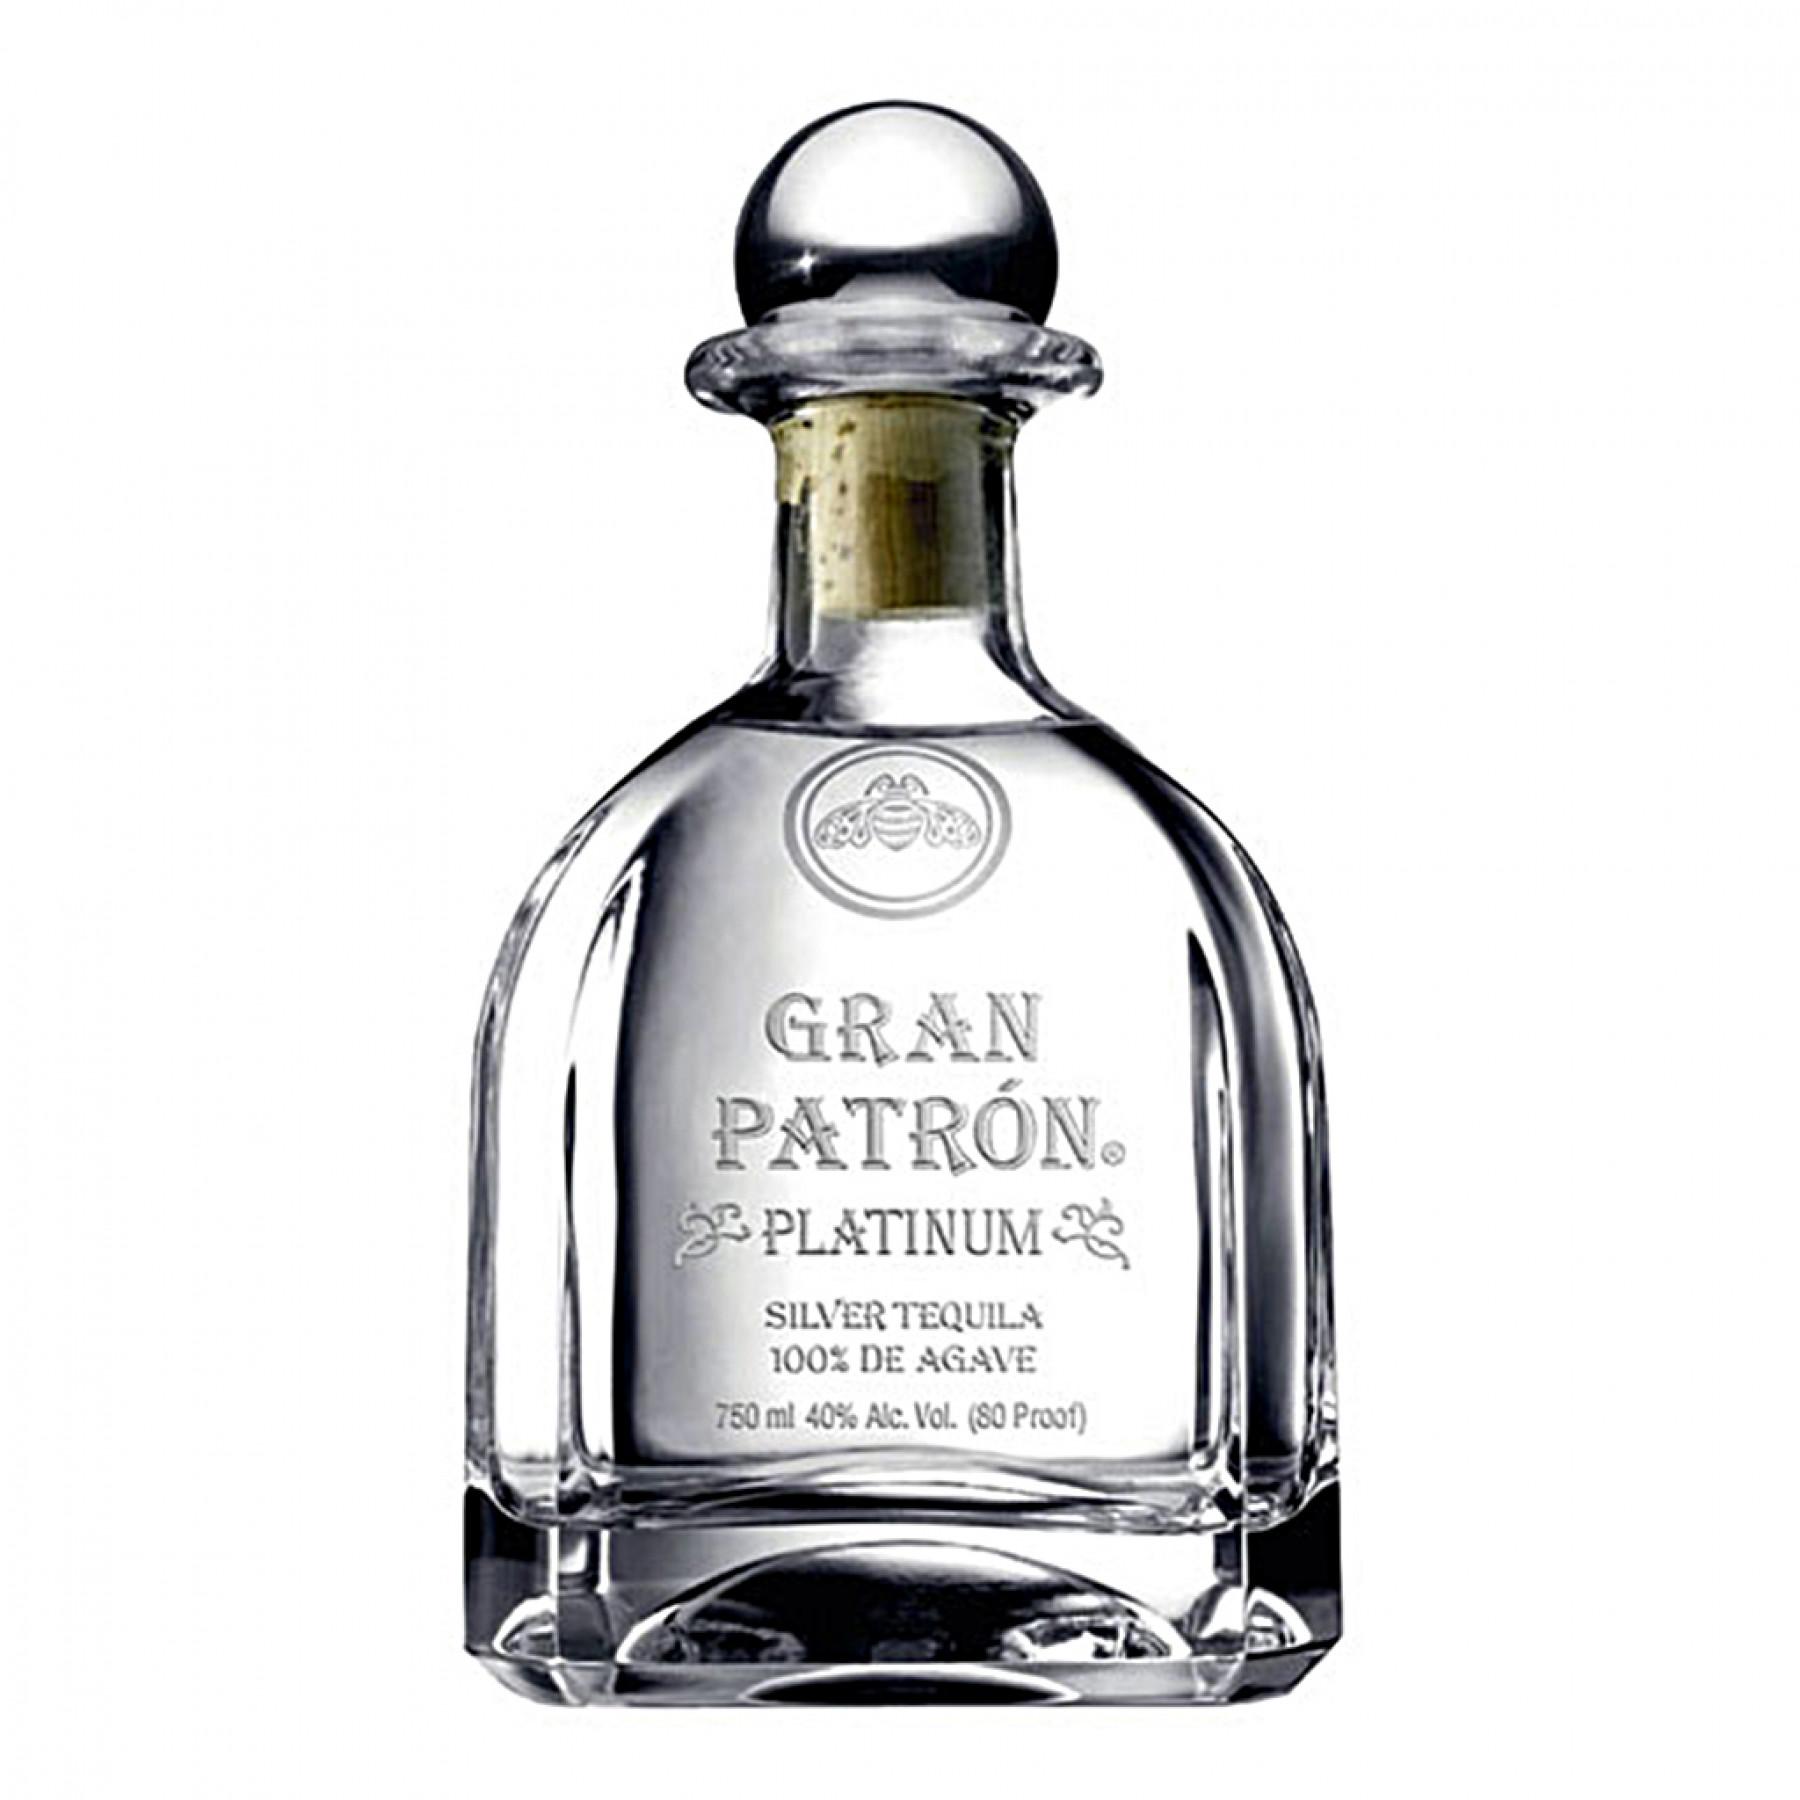 Gran Patrón Platinum Tequila cost